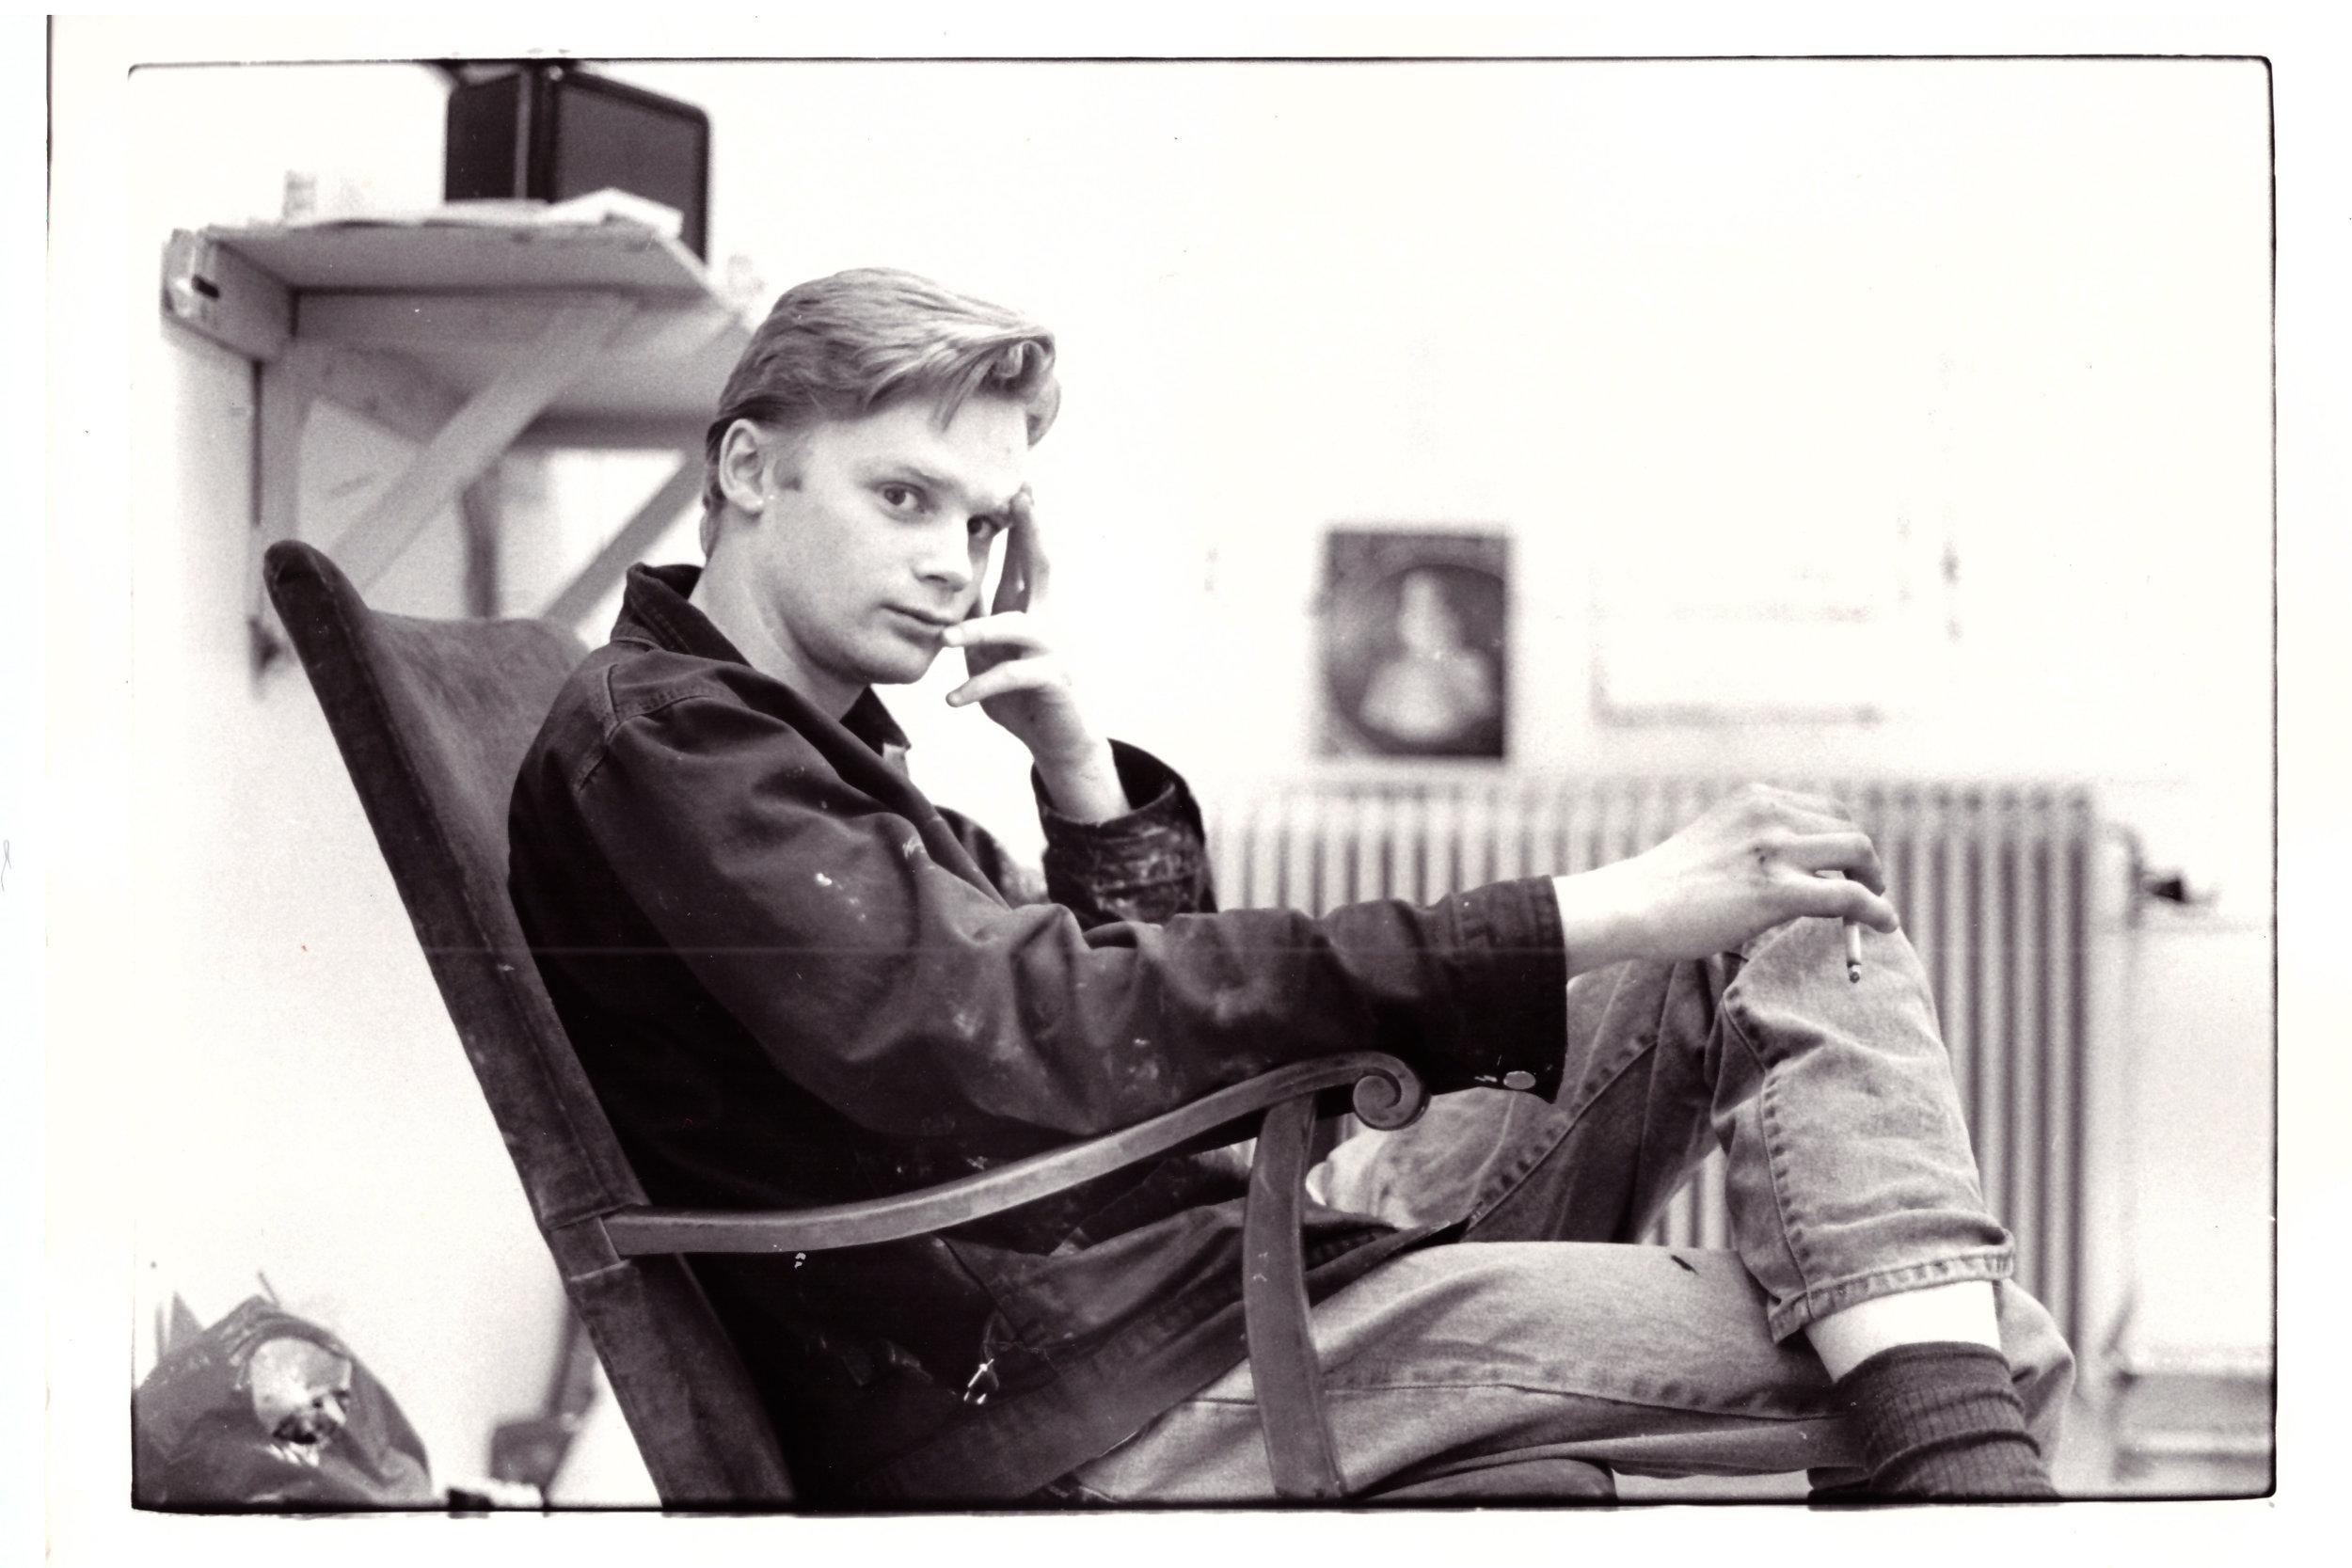 Dan Almqvist 1987